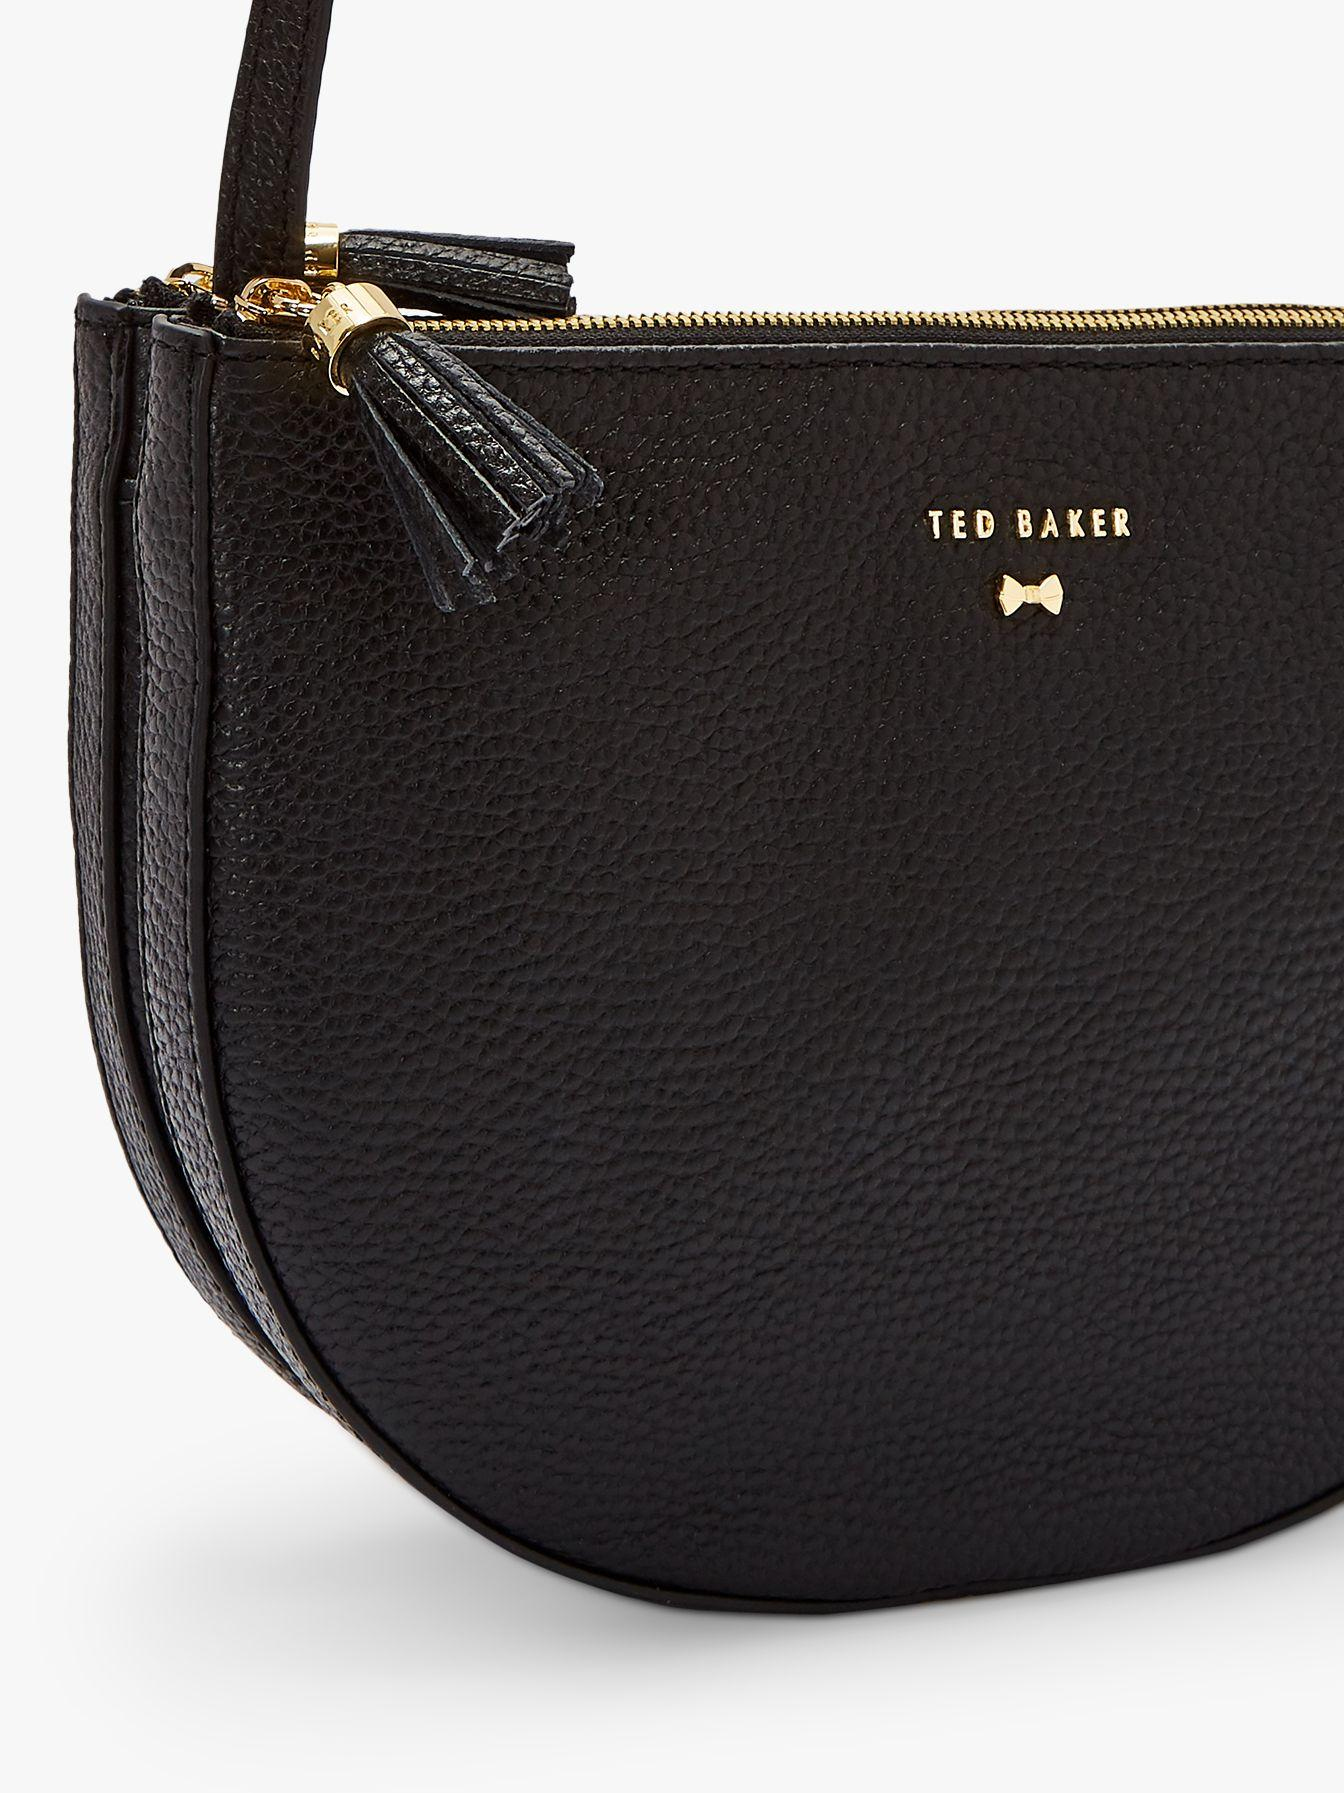 42e65b4e3f5d Ted Baker - White Suzzane Leather Double Zip Cross Body Bag - Lyst. View  fullscreen